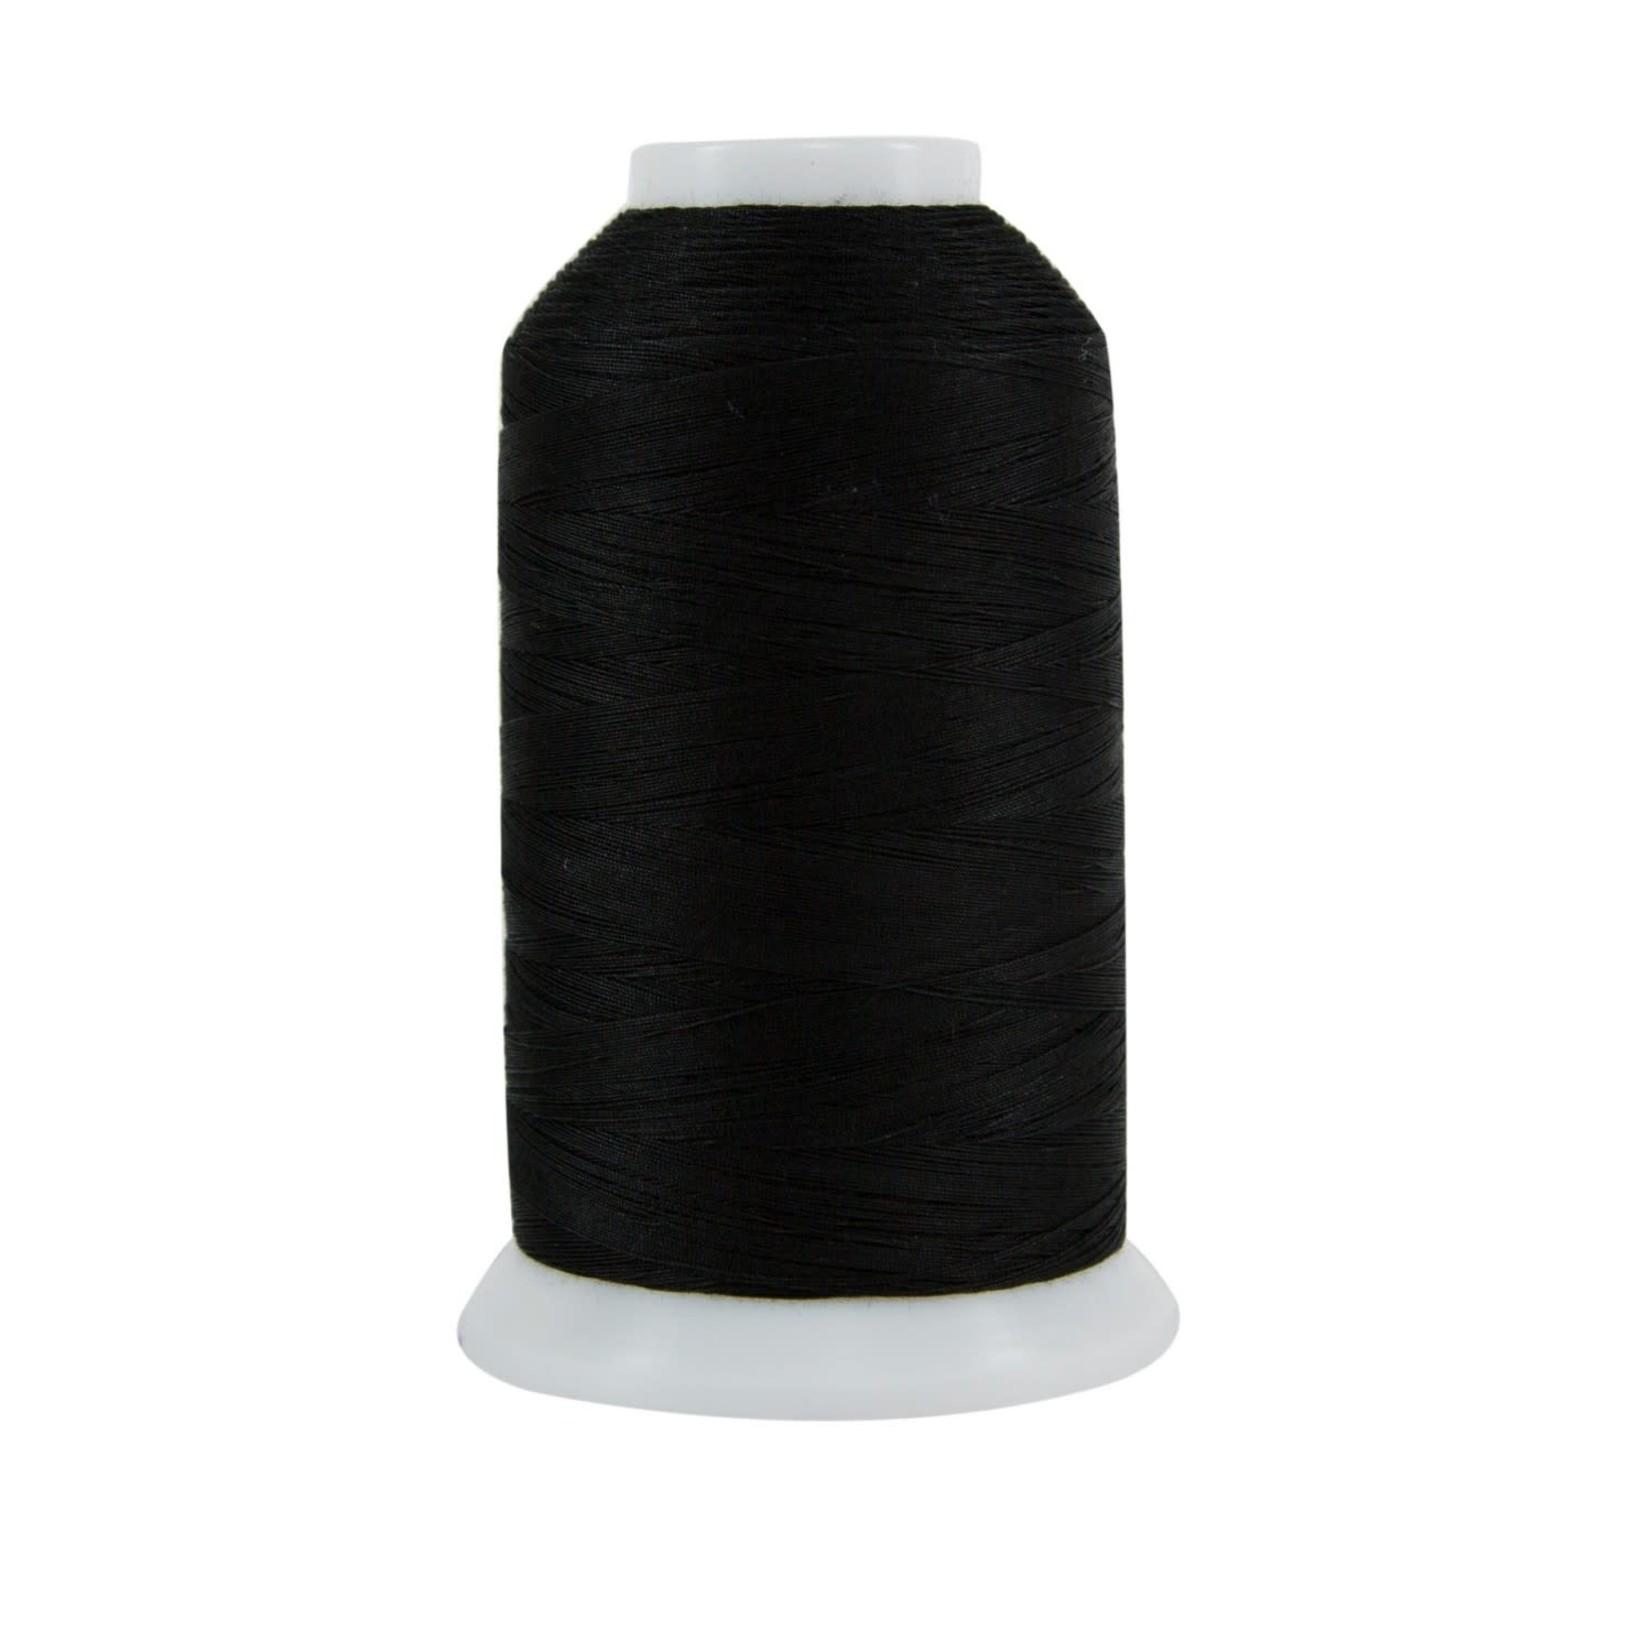 Superior Threads King Tut - #40 - 1828 m - 0977 Ebony